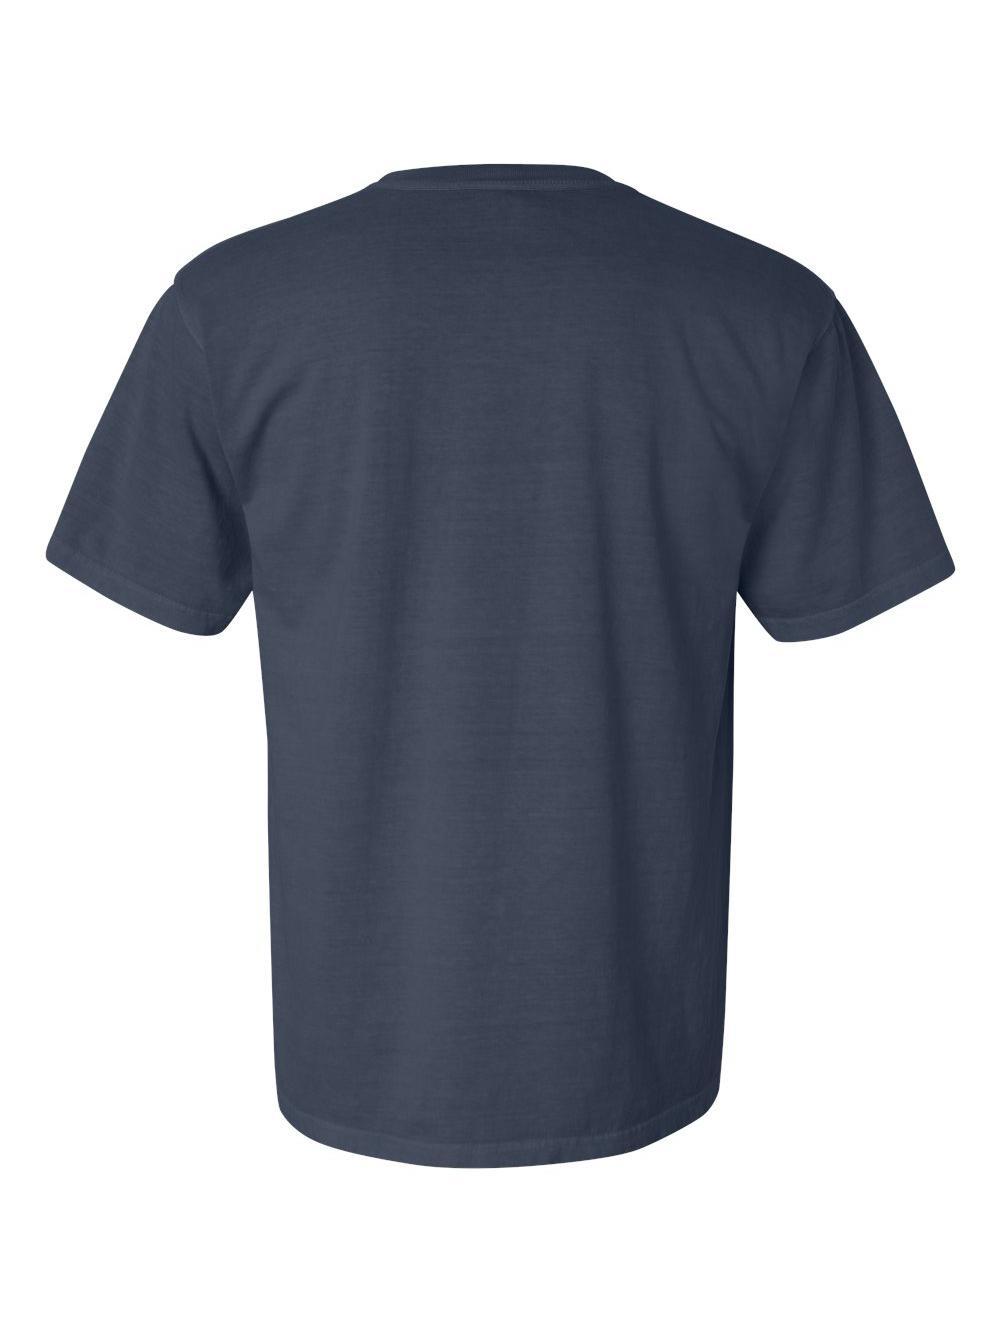 Comfort-Colors-Garment-Dyed-Heavyweight-Ringspun-Short-Sleeve-Shirt-1717 thumbnail 49